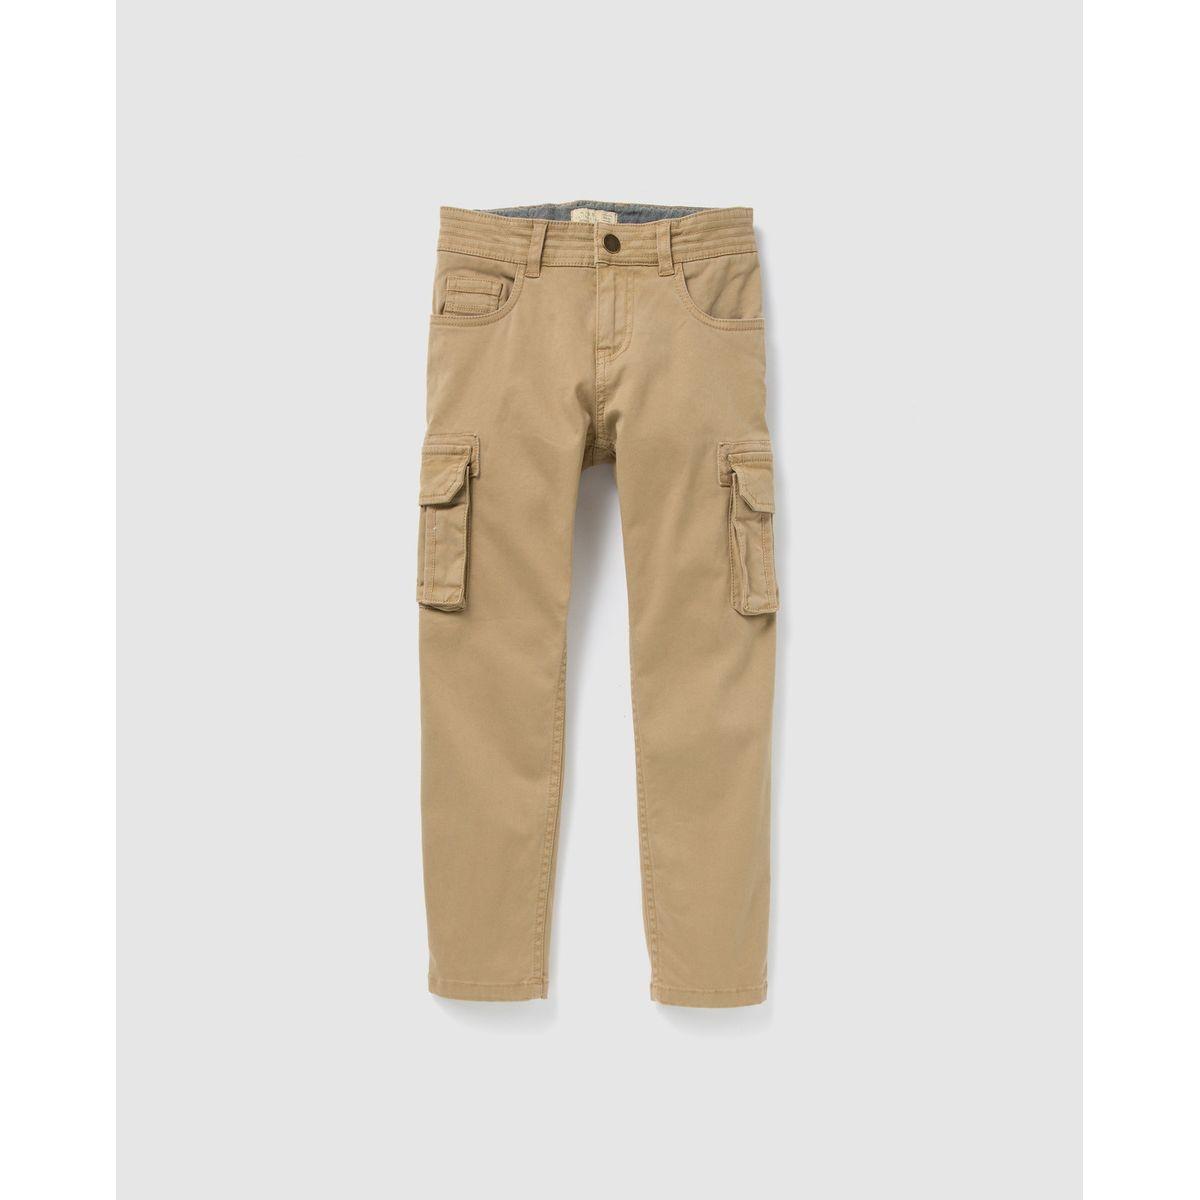 Pantalon  poches multiples